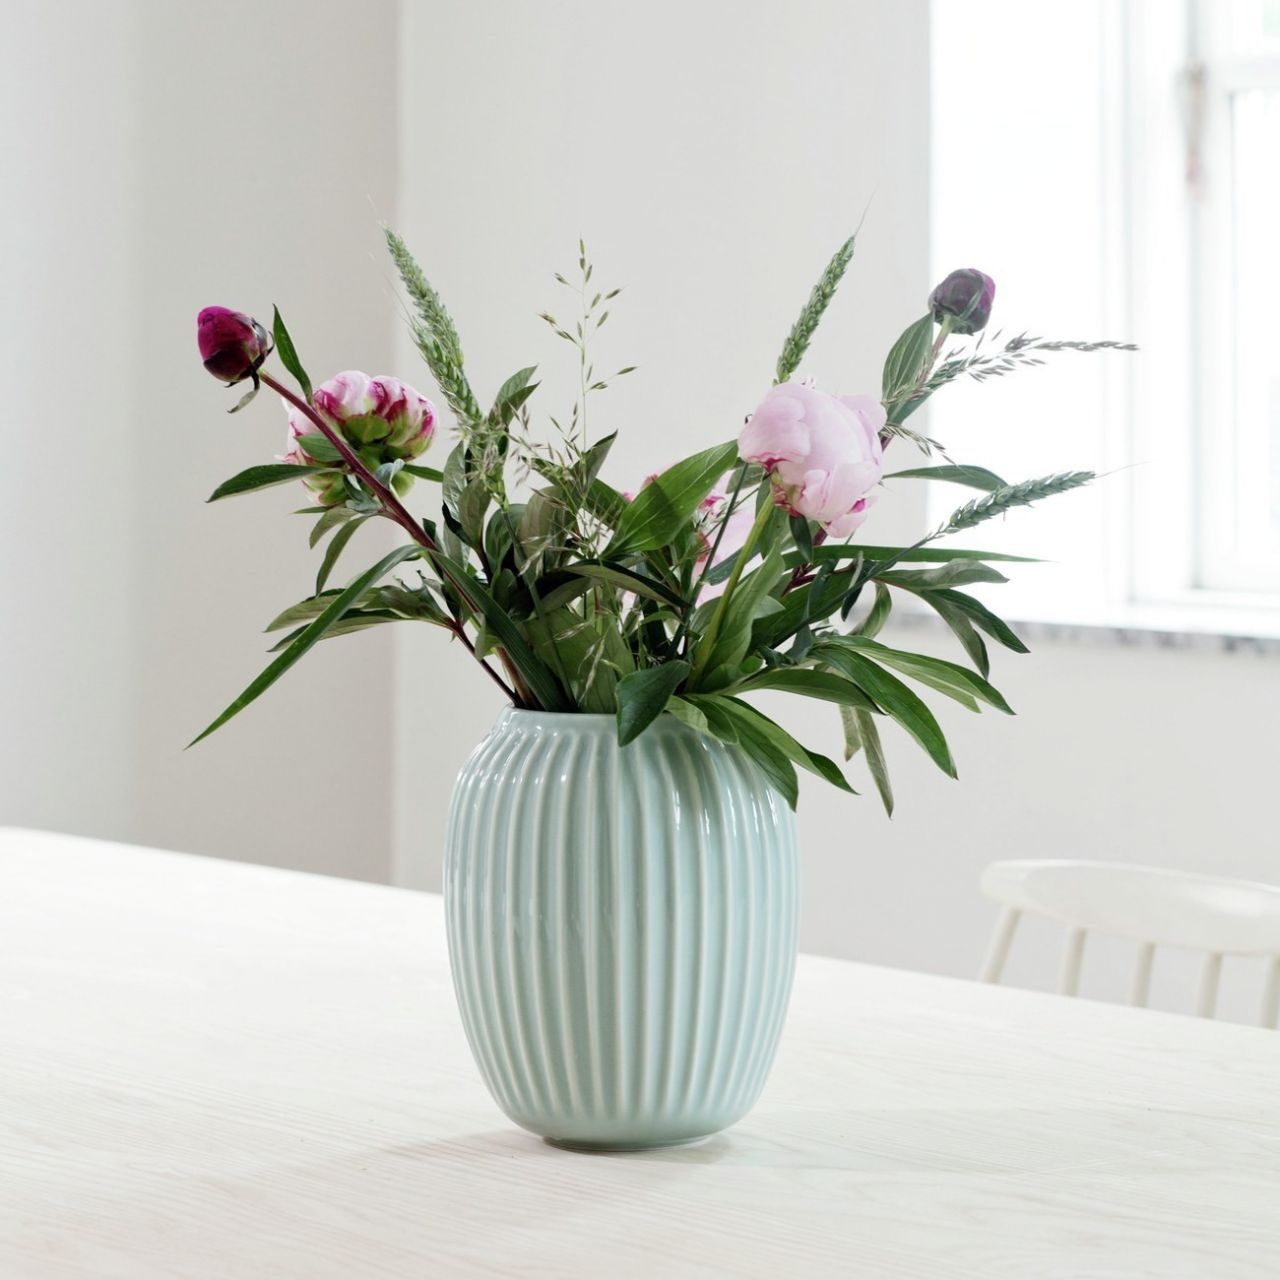 Kähler - Hammershoi Vase H200